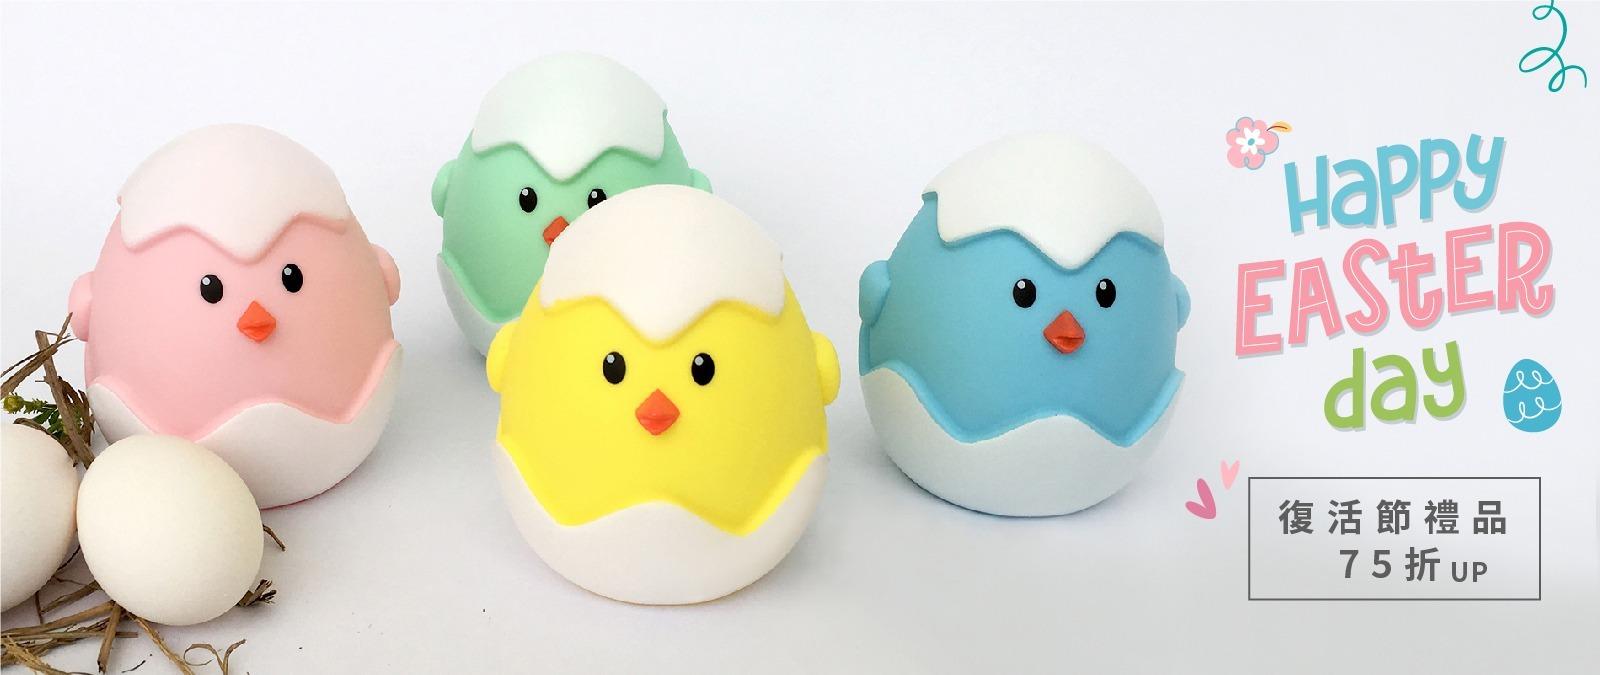 Happy Easter!復活節禮品75折起